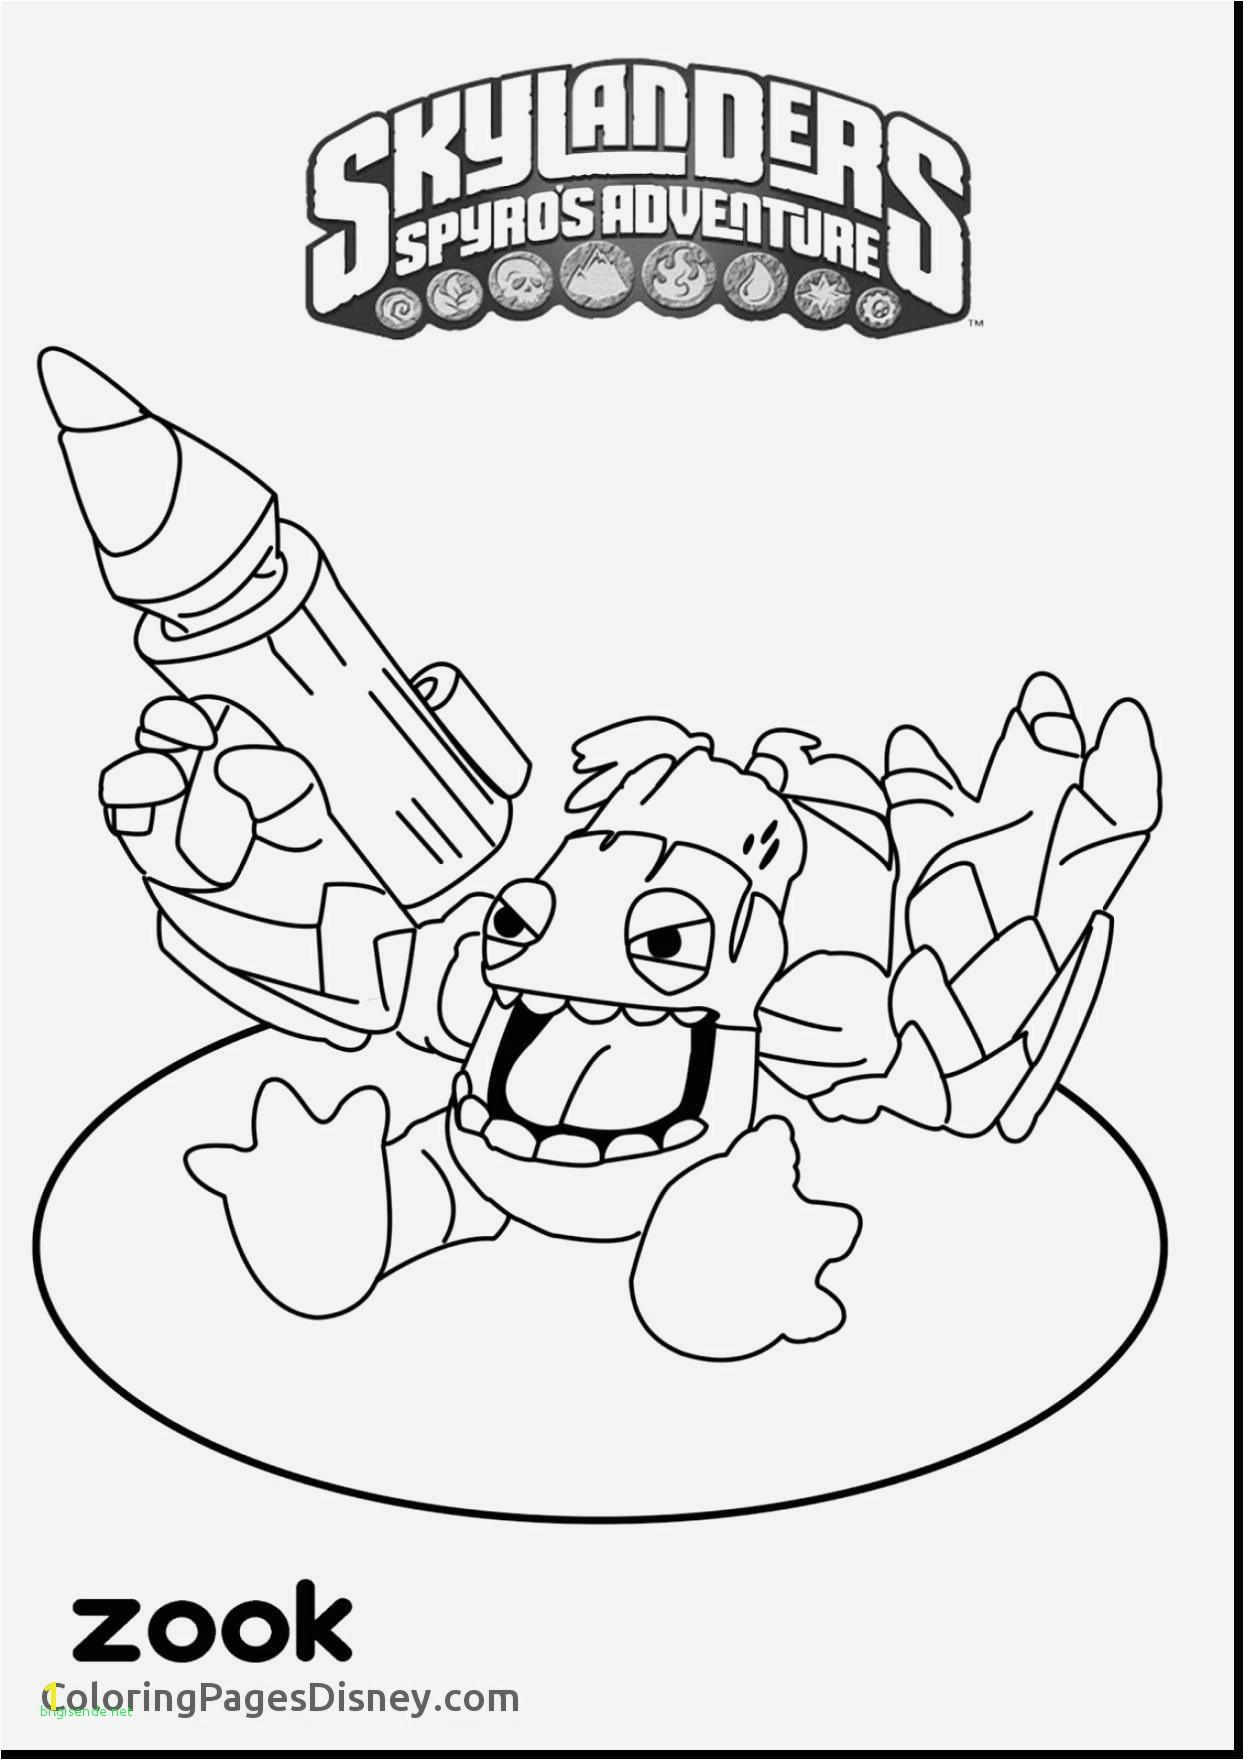 Free Printable Disney Coloring Books Pdf Elegant 18cute Disney Coloring Pages Line Clip Arts & Coloring